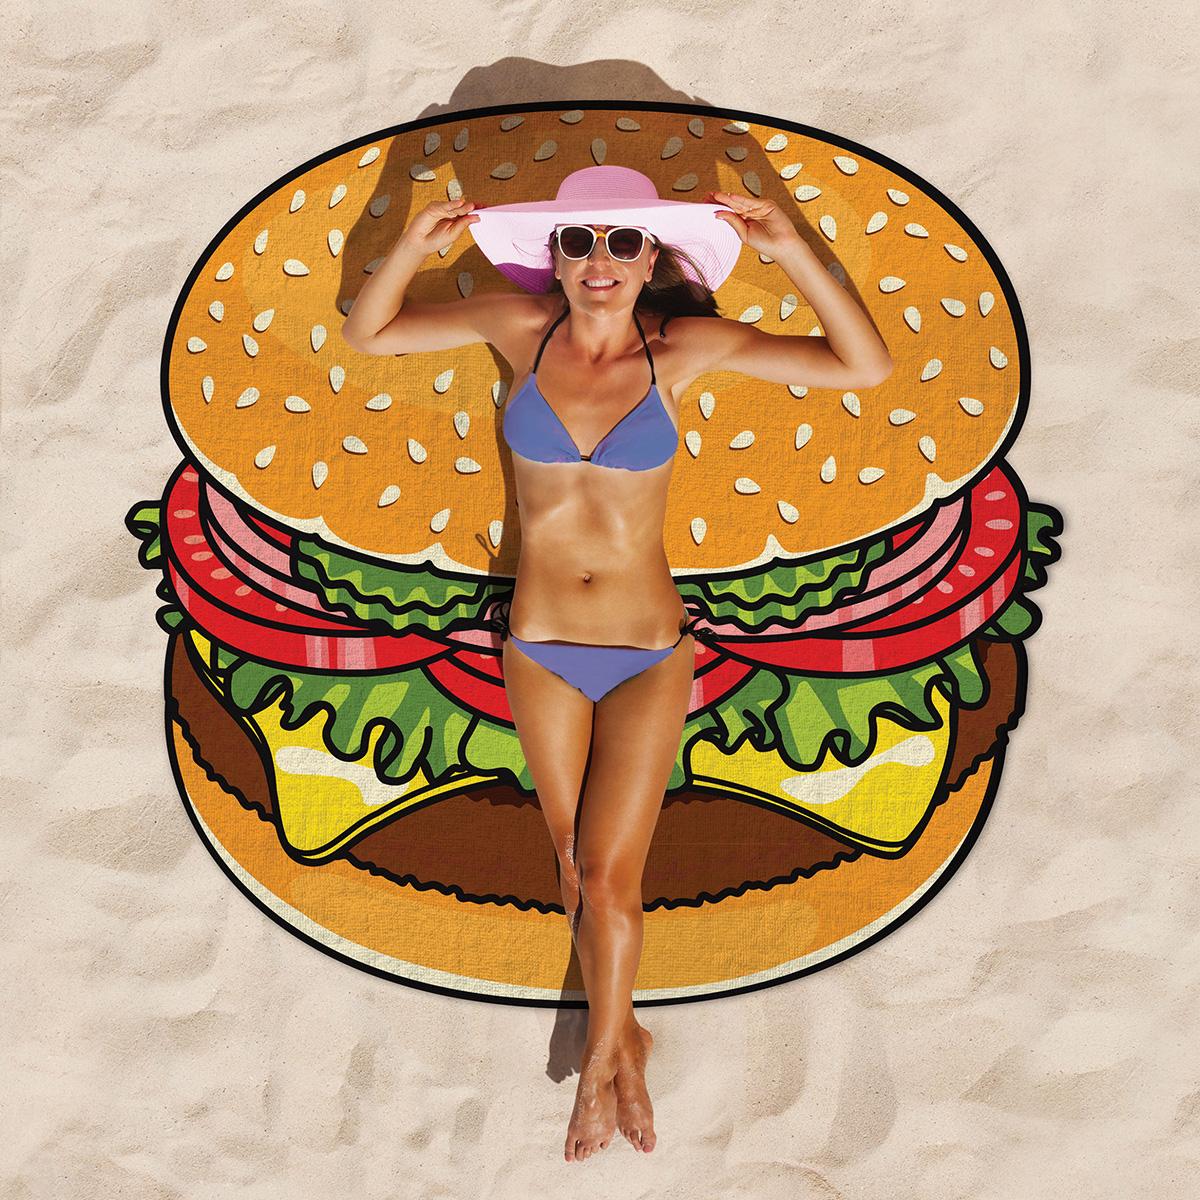 Cheeseburger strandlaken